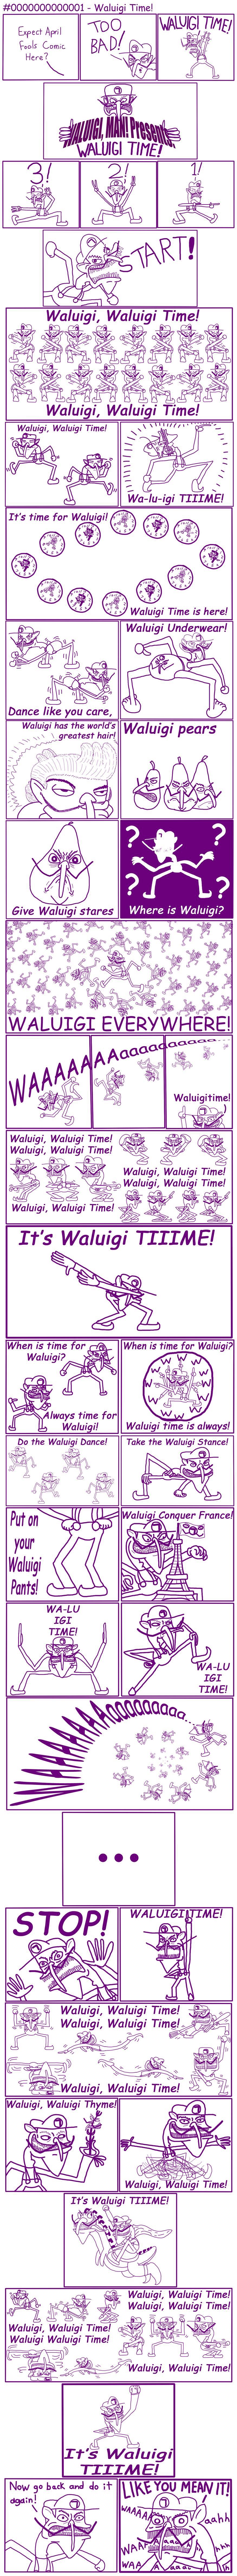 Waluigi, Man! #0000000000001 - Waluigi Time!